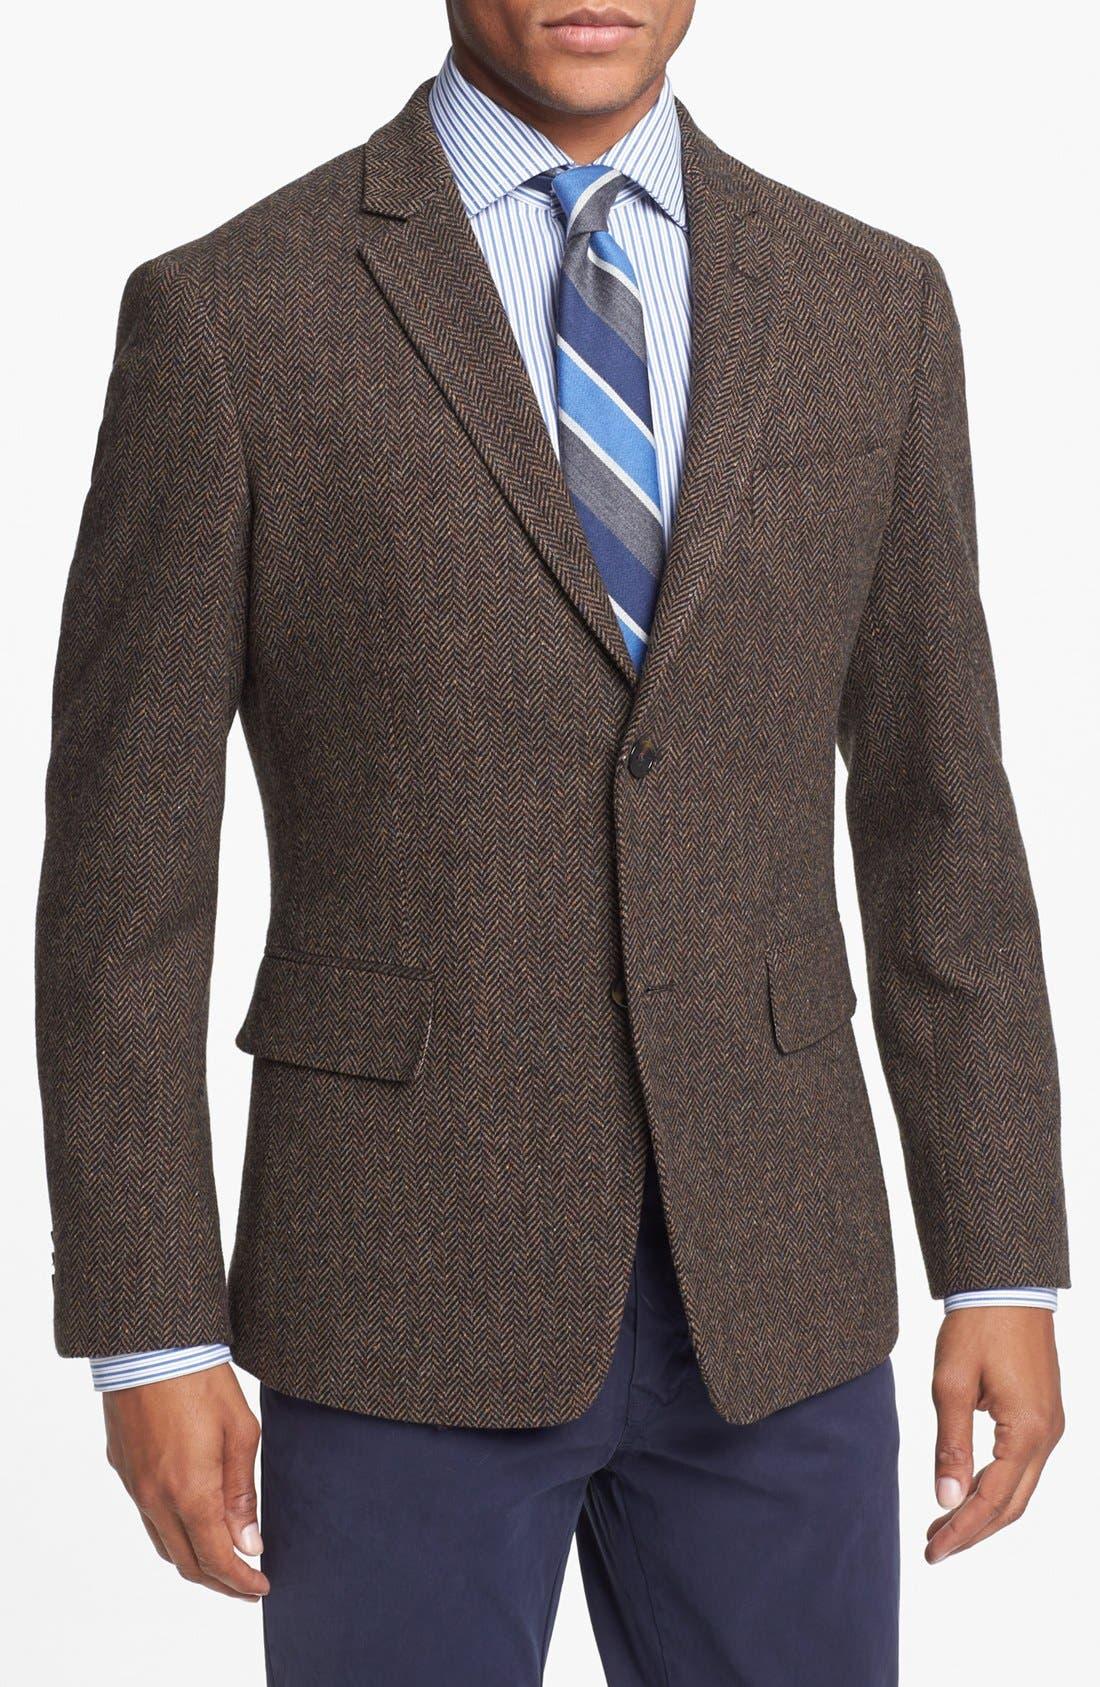 Alternate Image 1 Selected - Wallin & Bros. Extra Trim Fit Herringbone Sportcoat